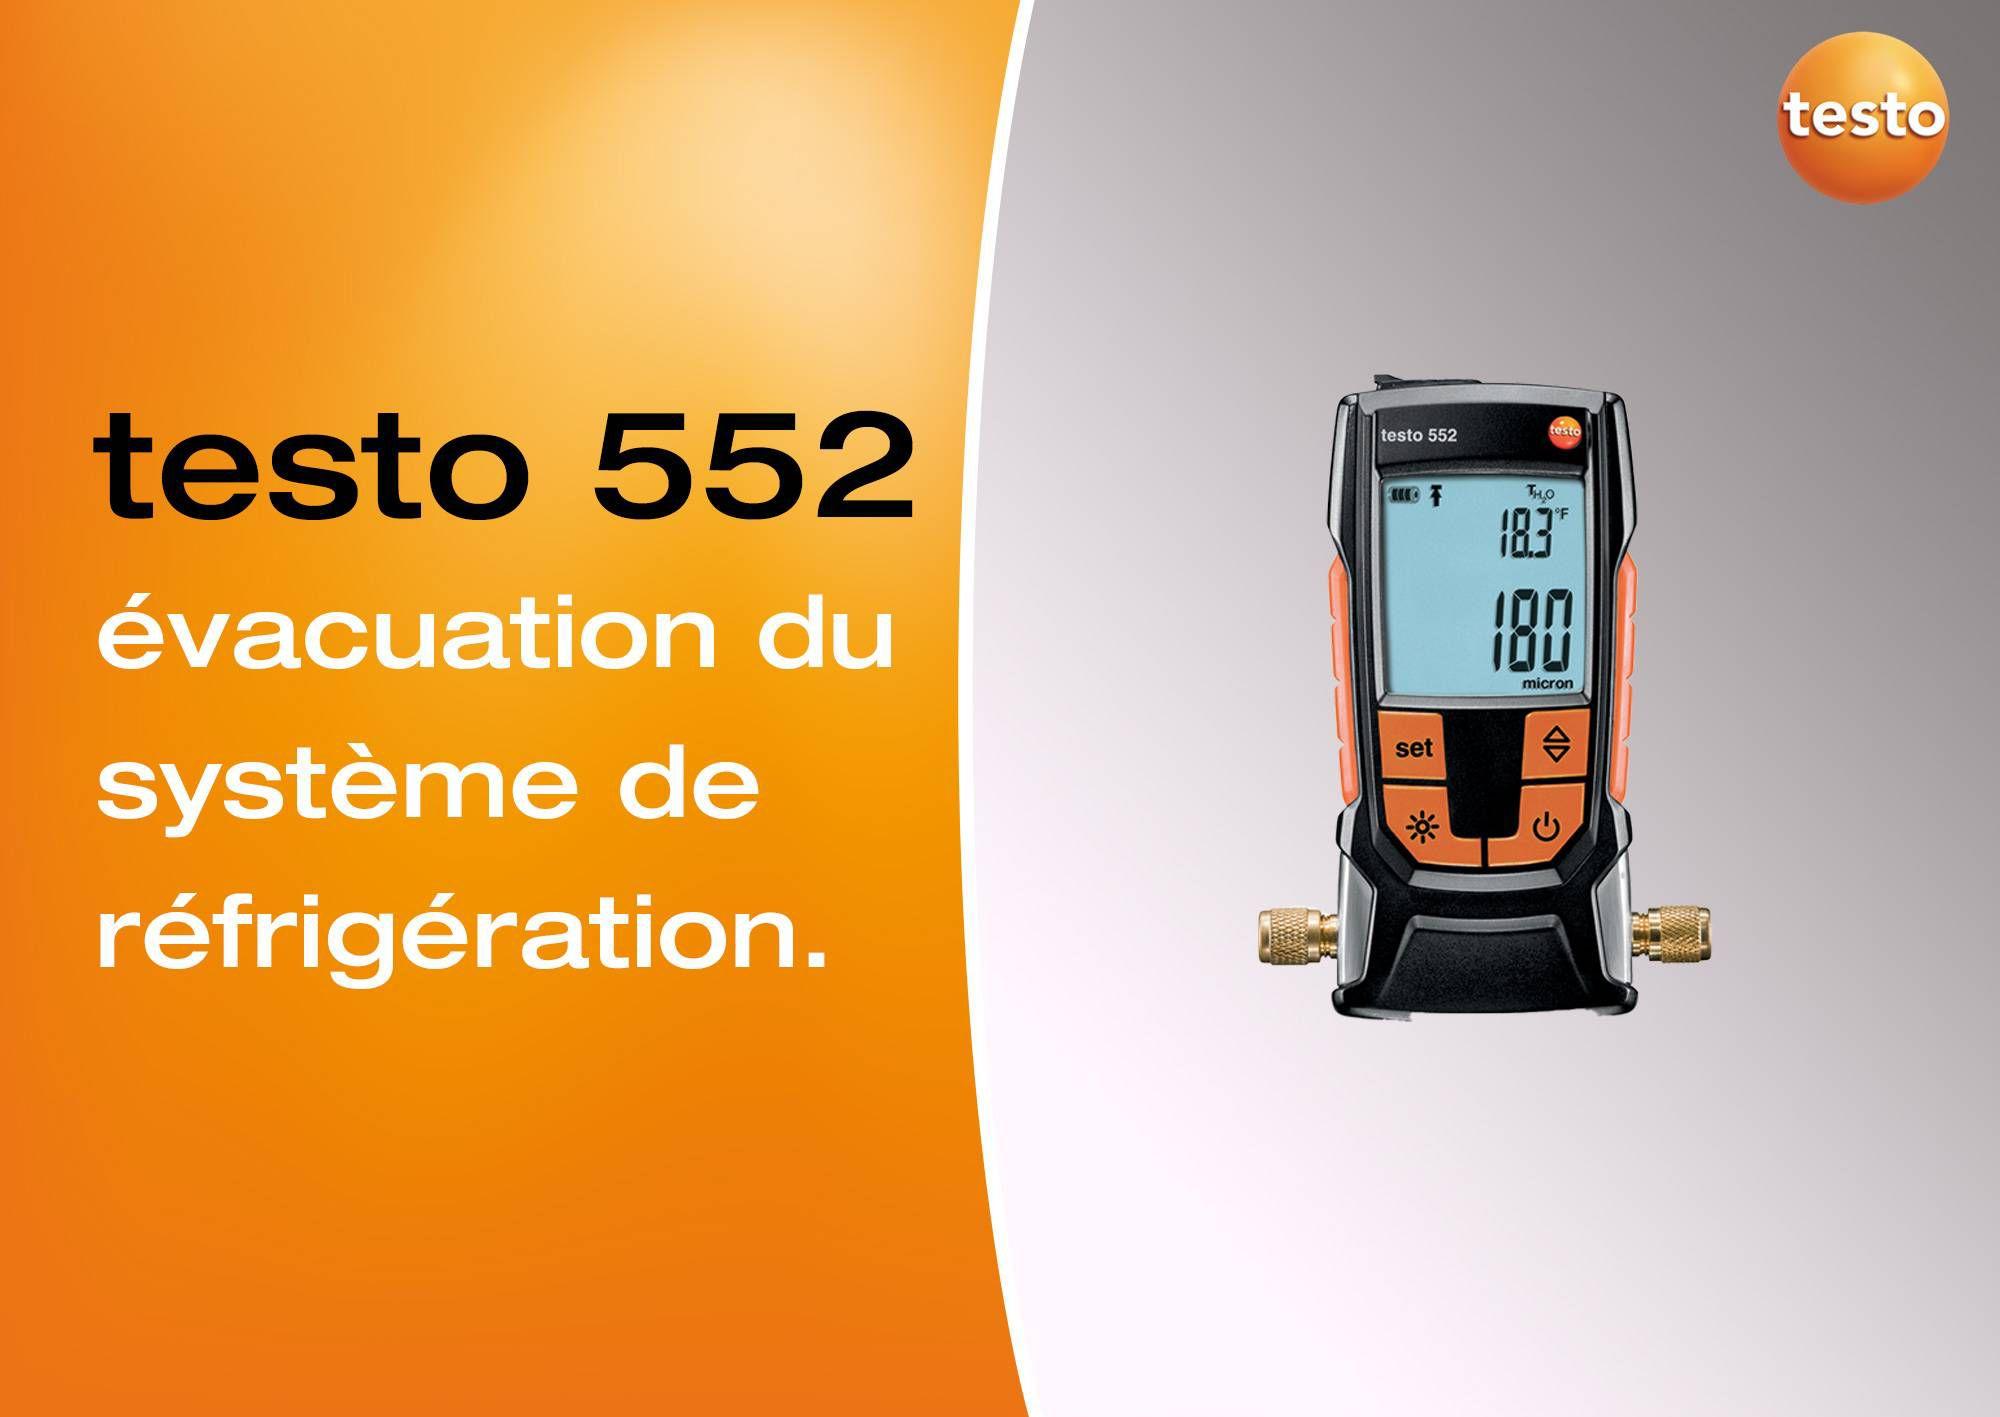 Tutoriel vidéo évacuation du système de réfrigération vacuomètre testo 552